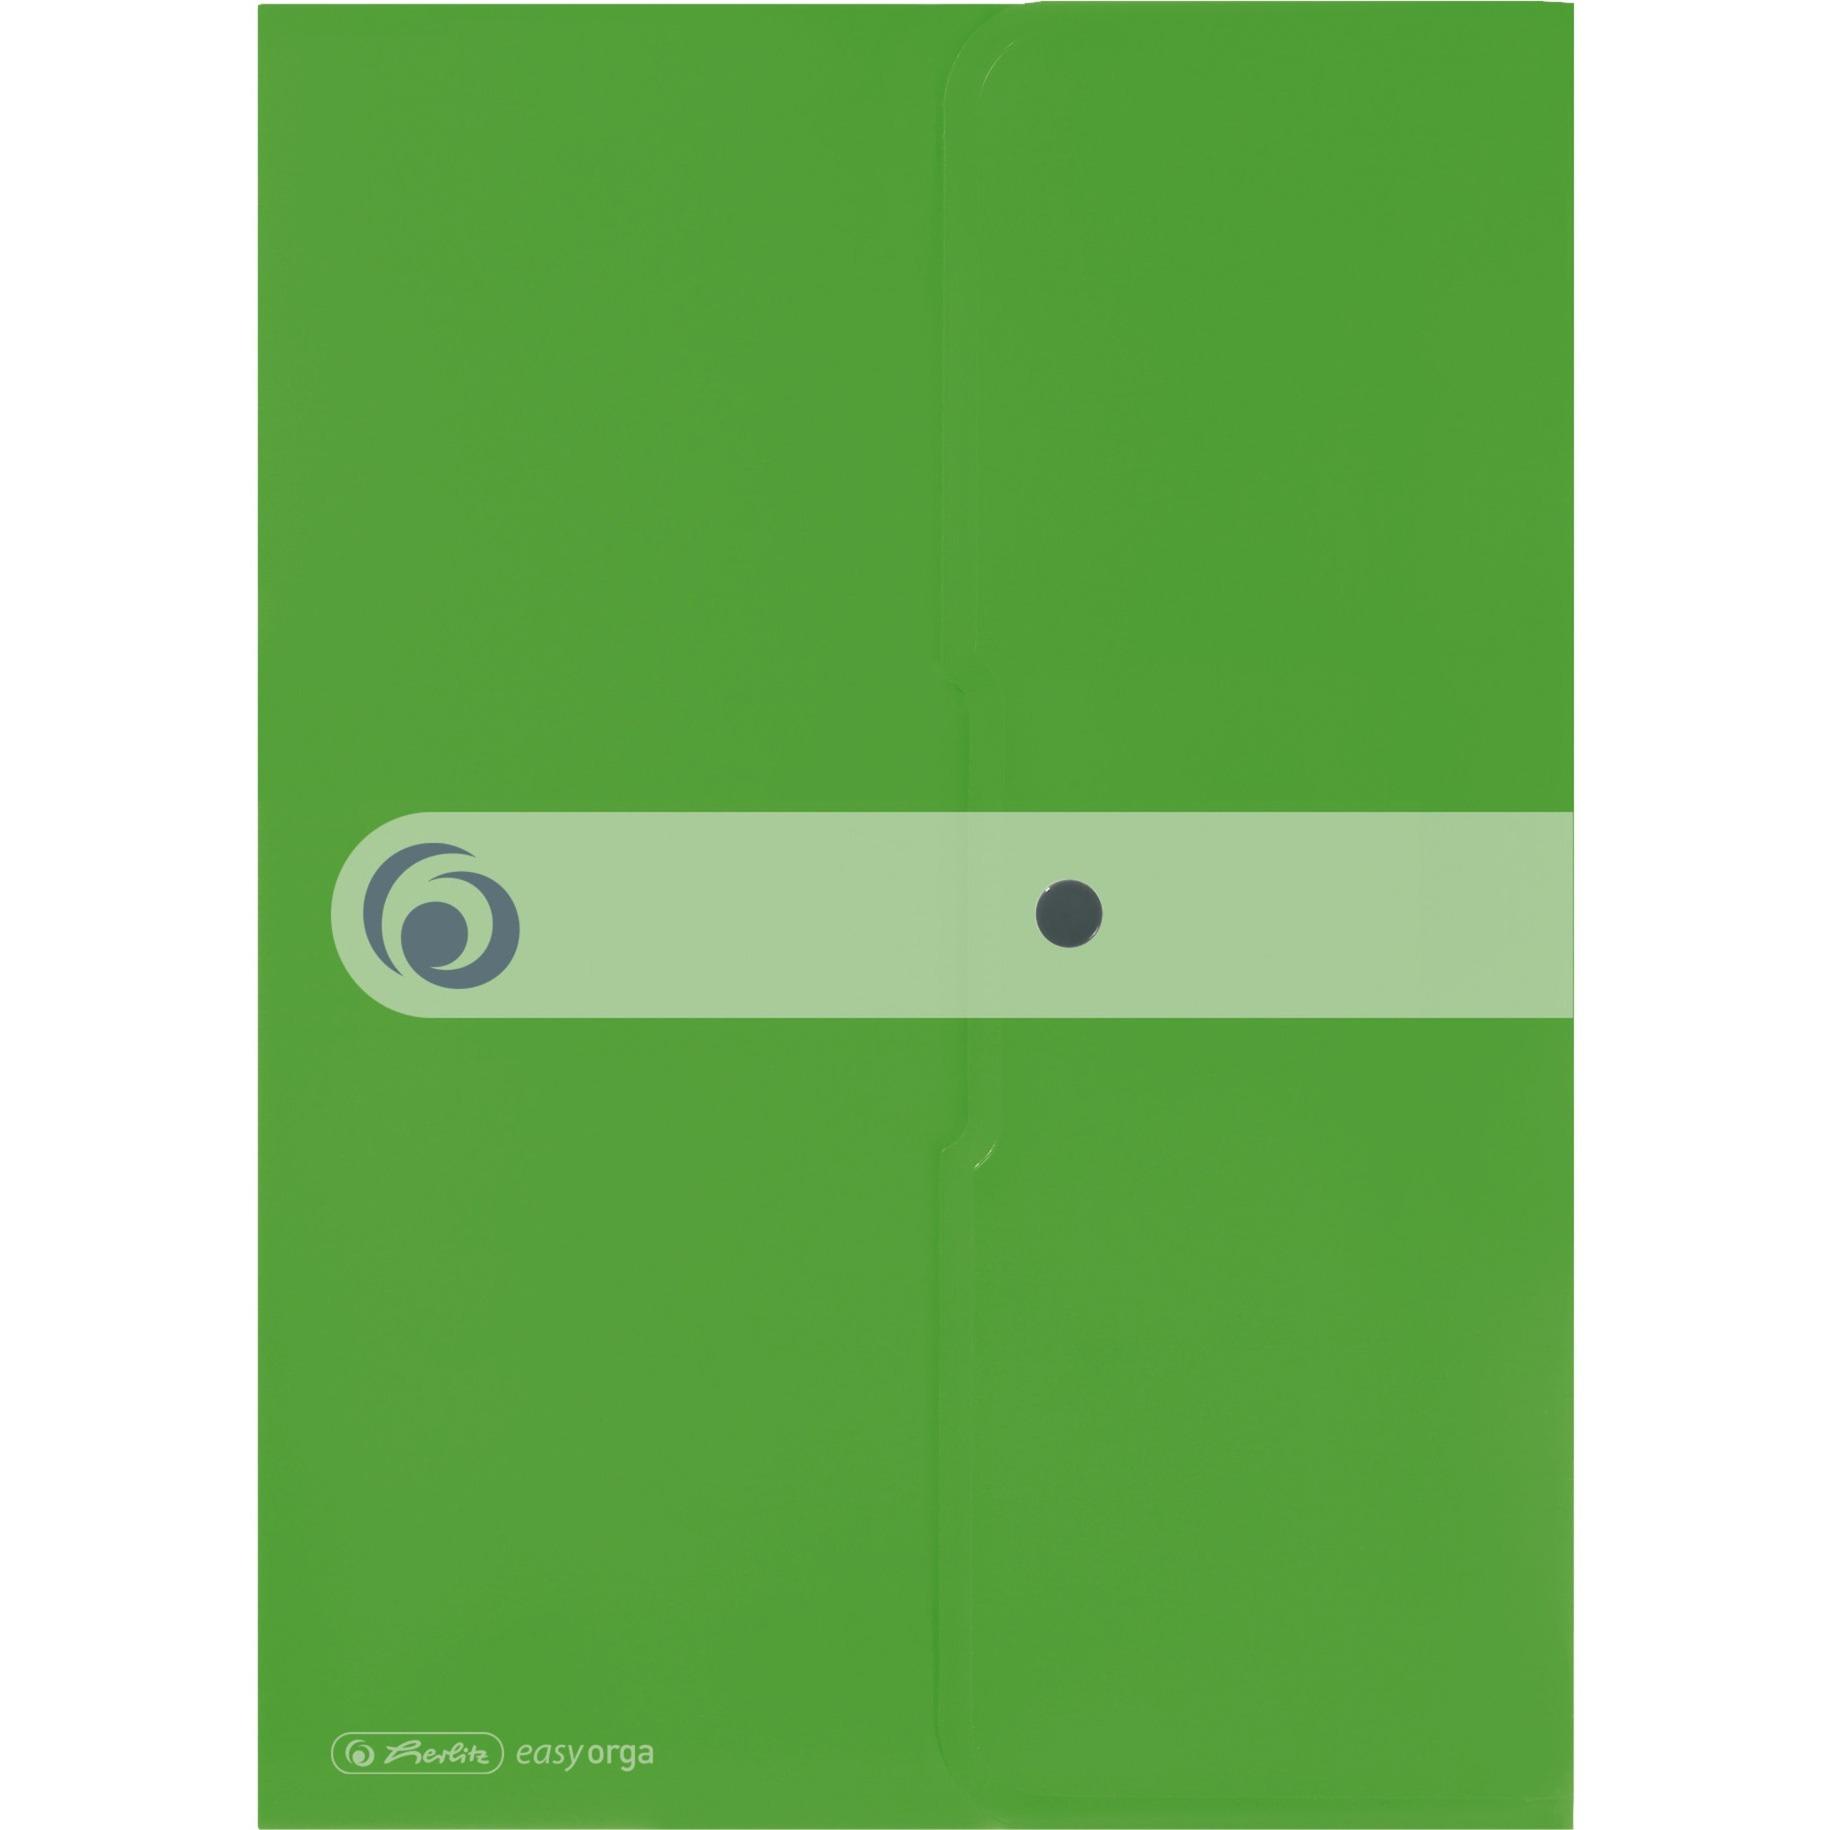 11227022 Polipropileno (PP) Verde carpeta, Bolsa